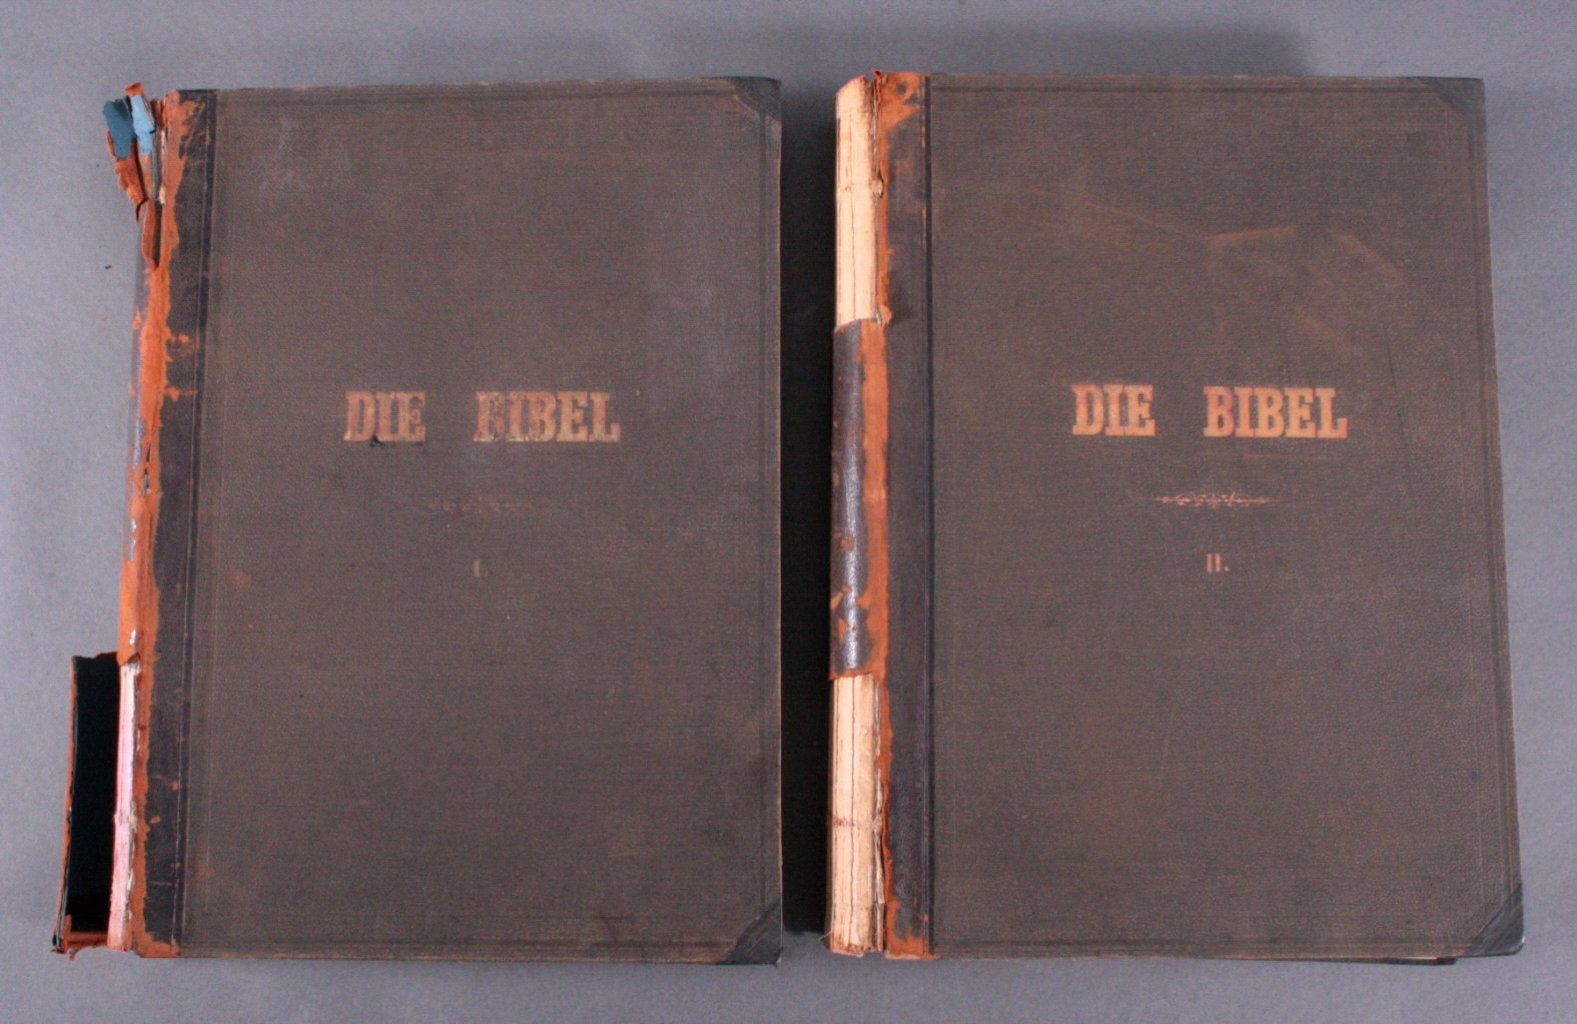 Doré – Bibel 2 Bände, wohl 1884